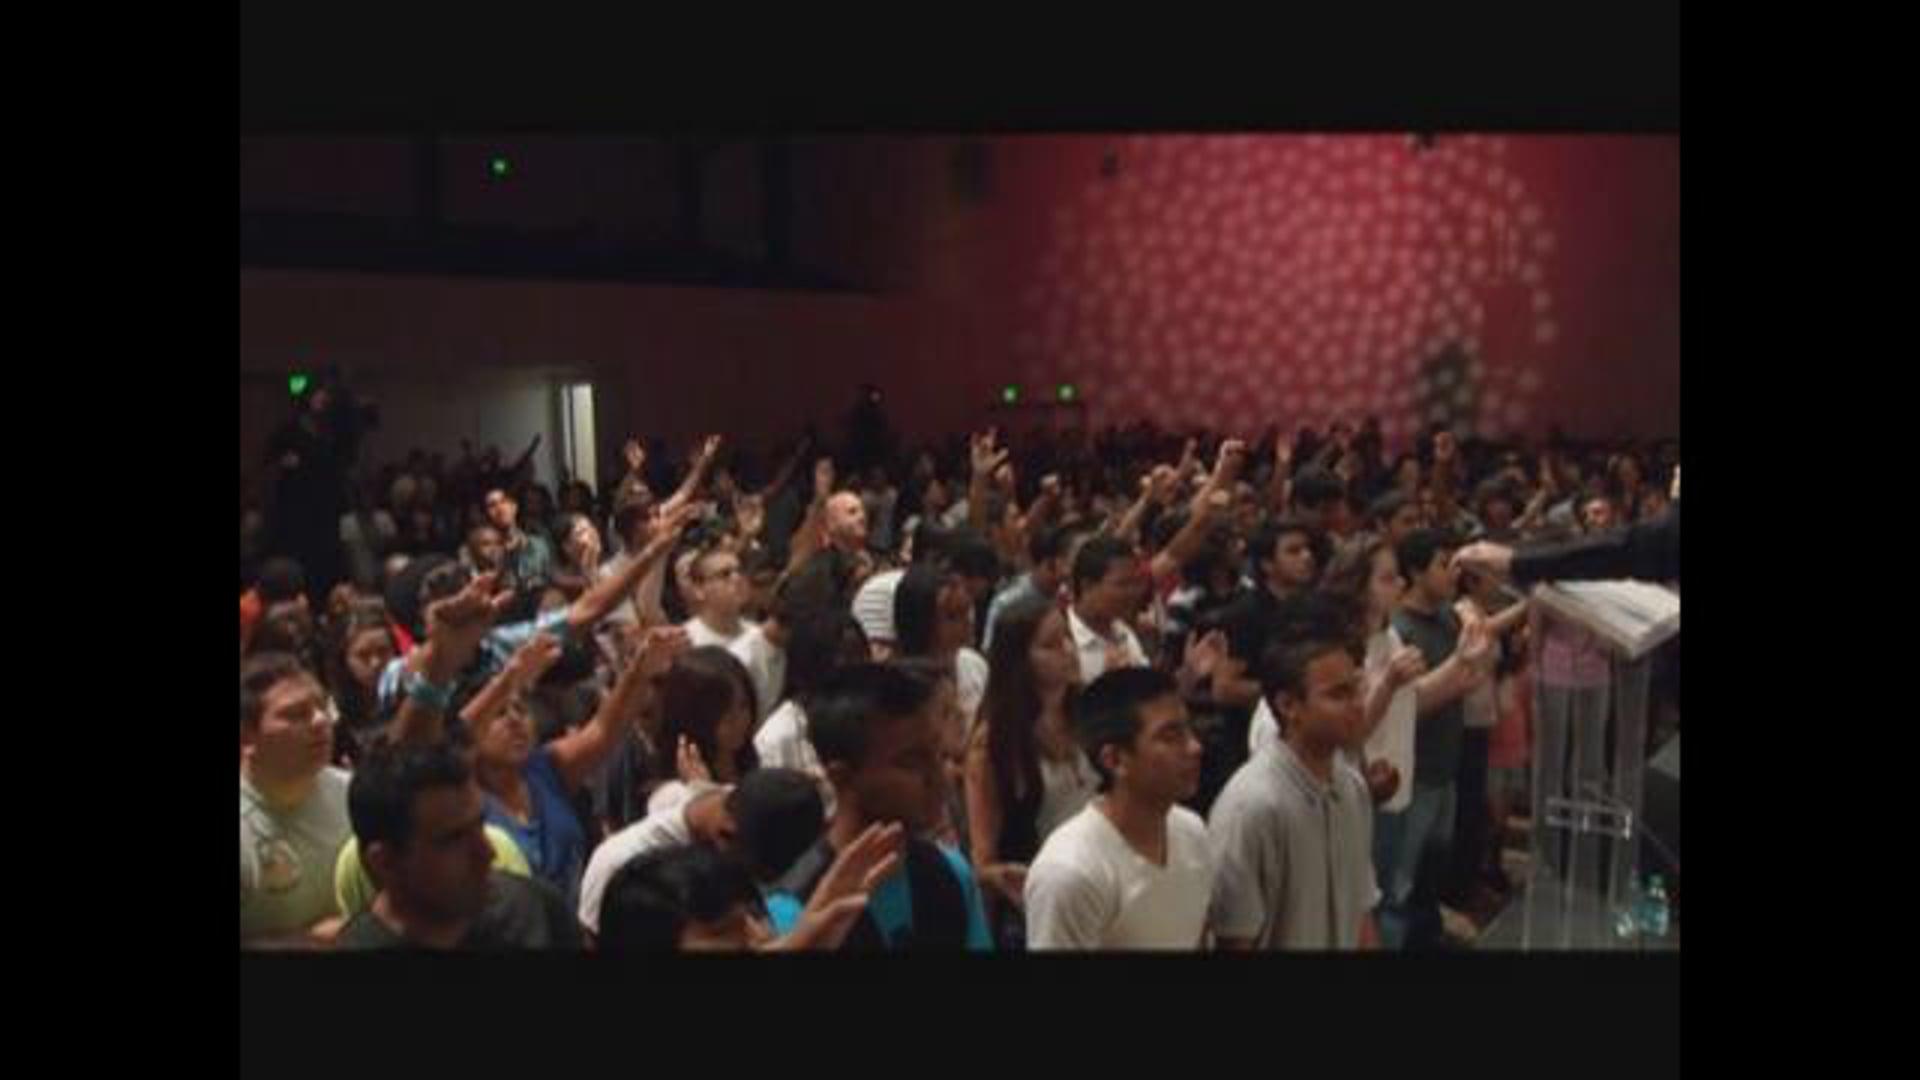 Josh Radford at Cornerstone Church TBN Youth Night